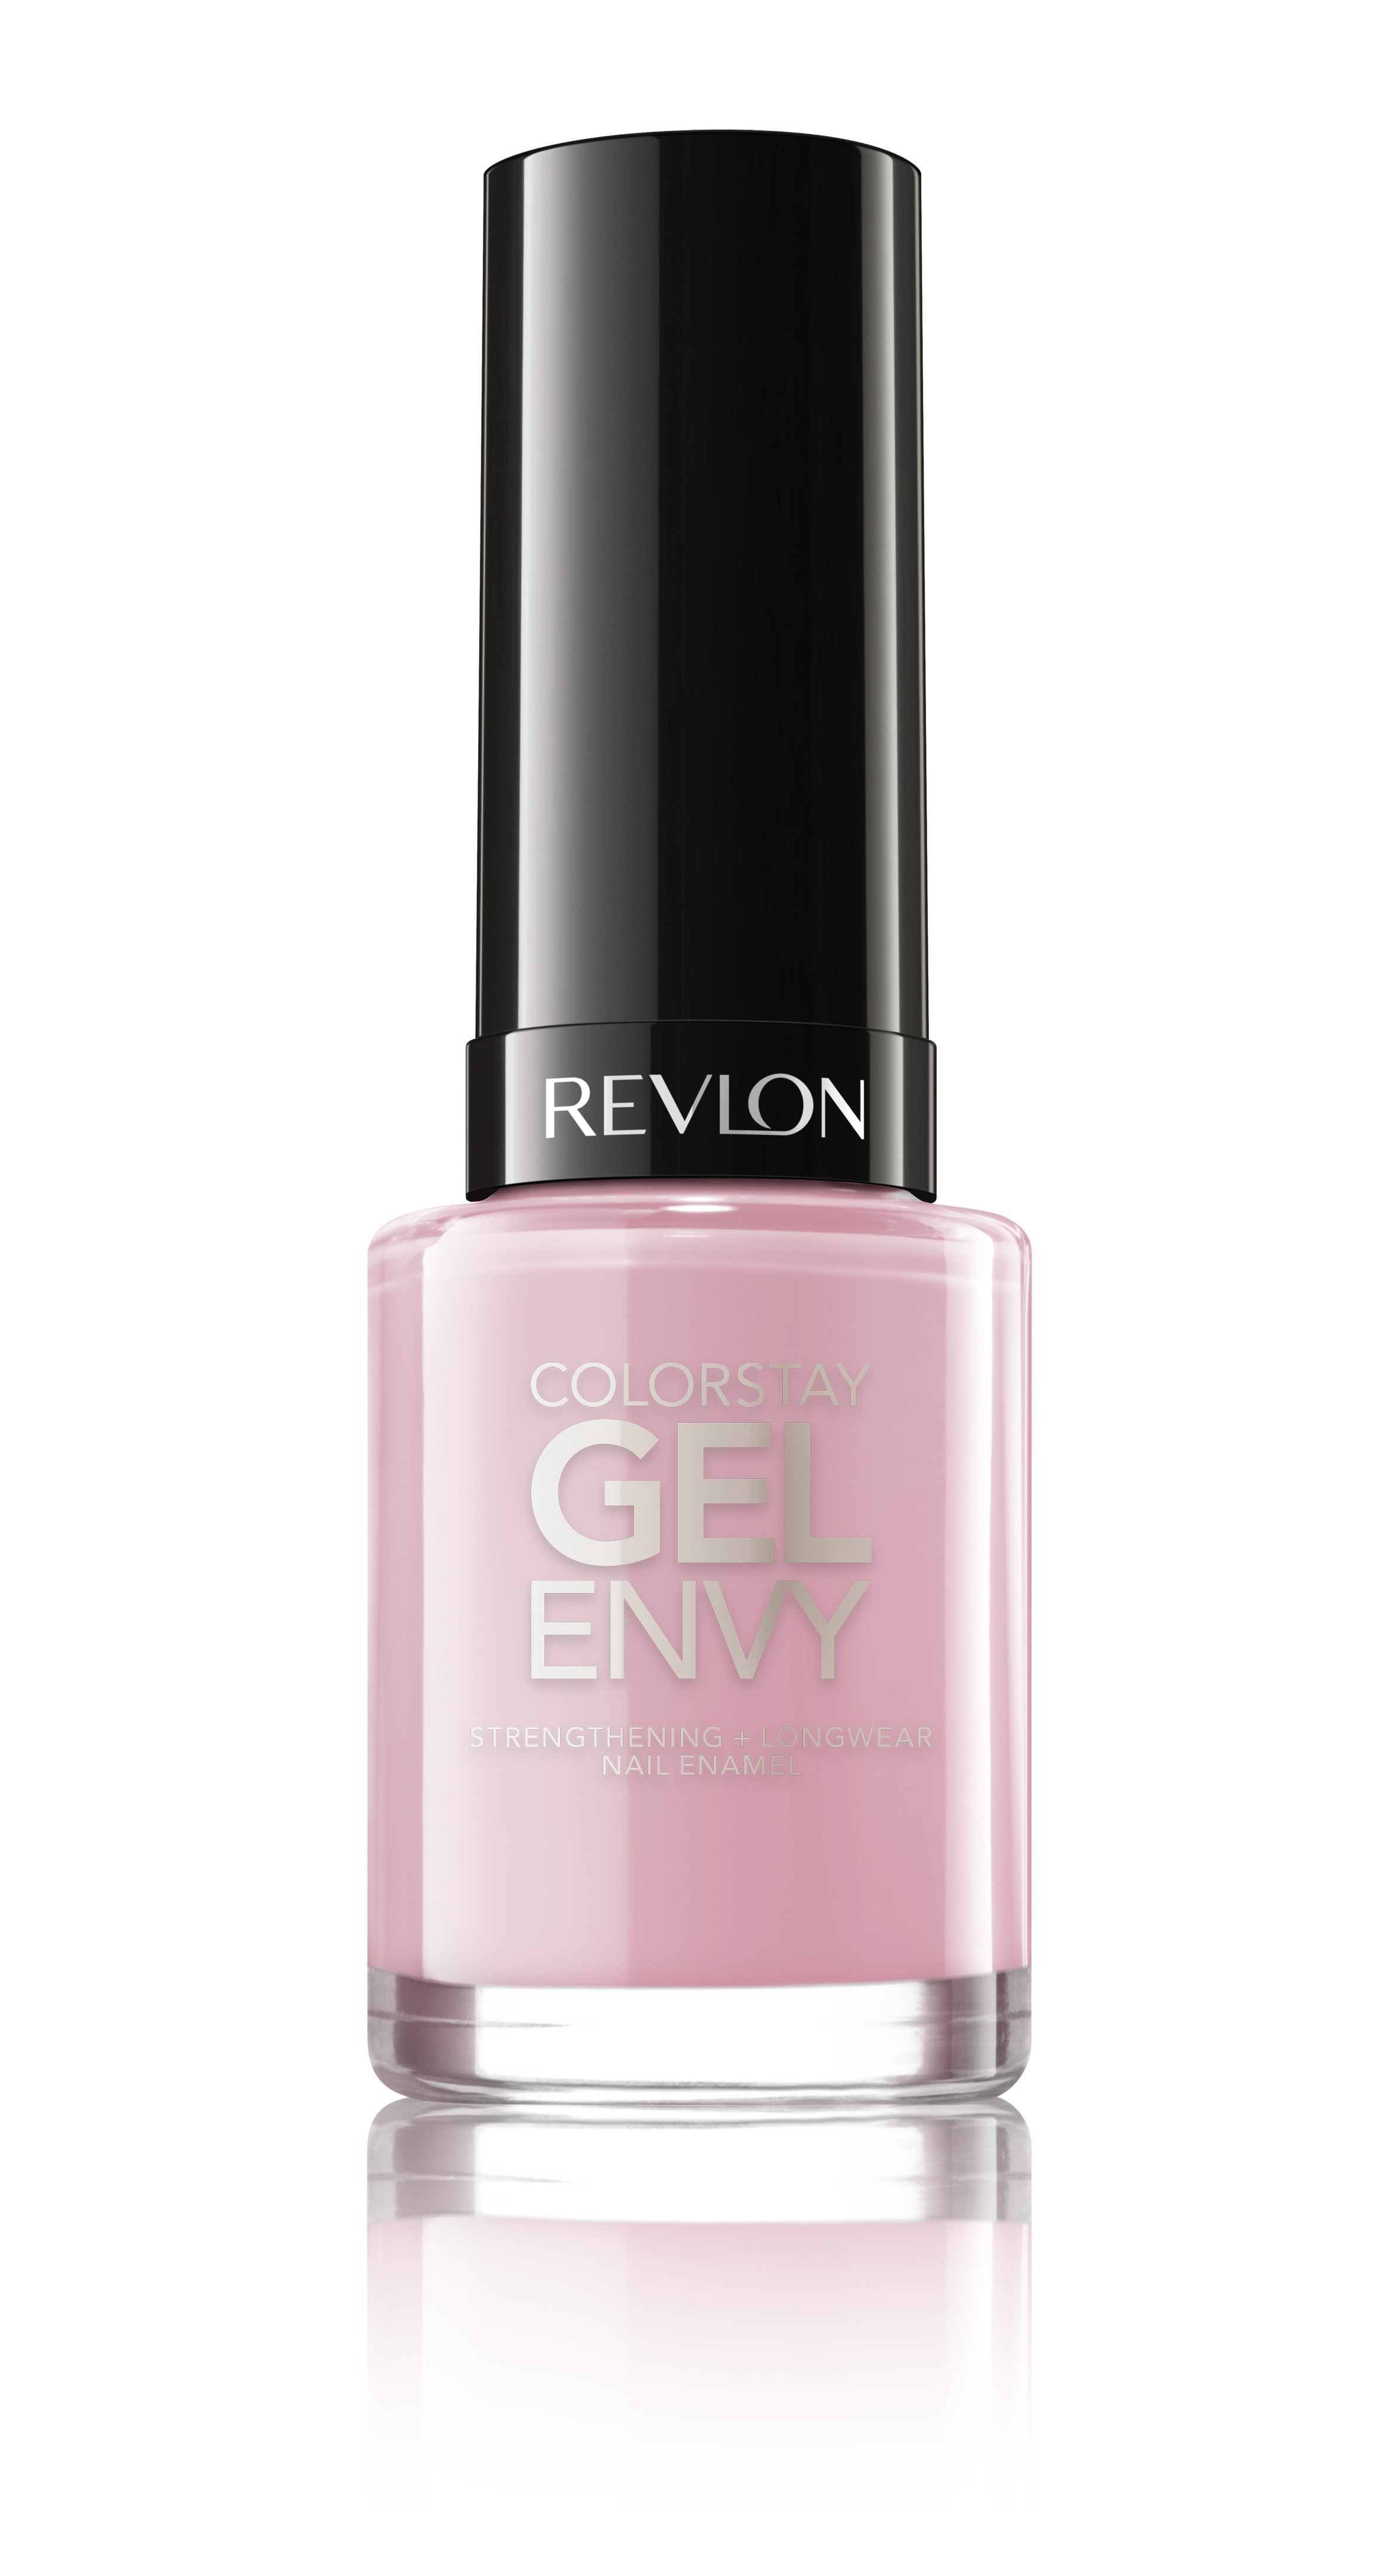 Revlon Colorstay Gel Envy #122-tippy Toes